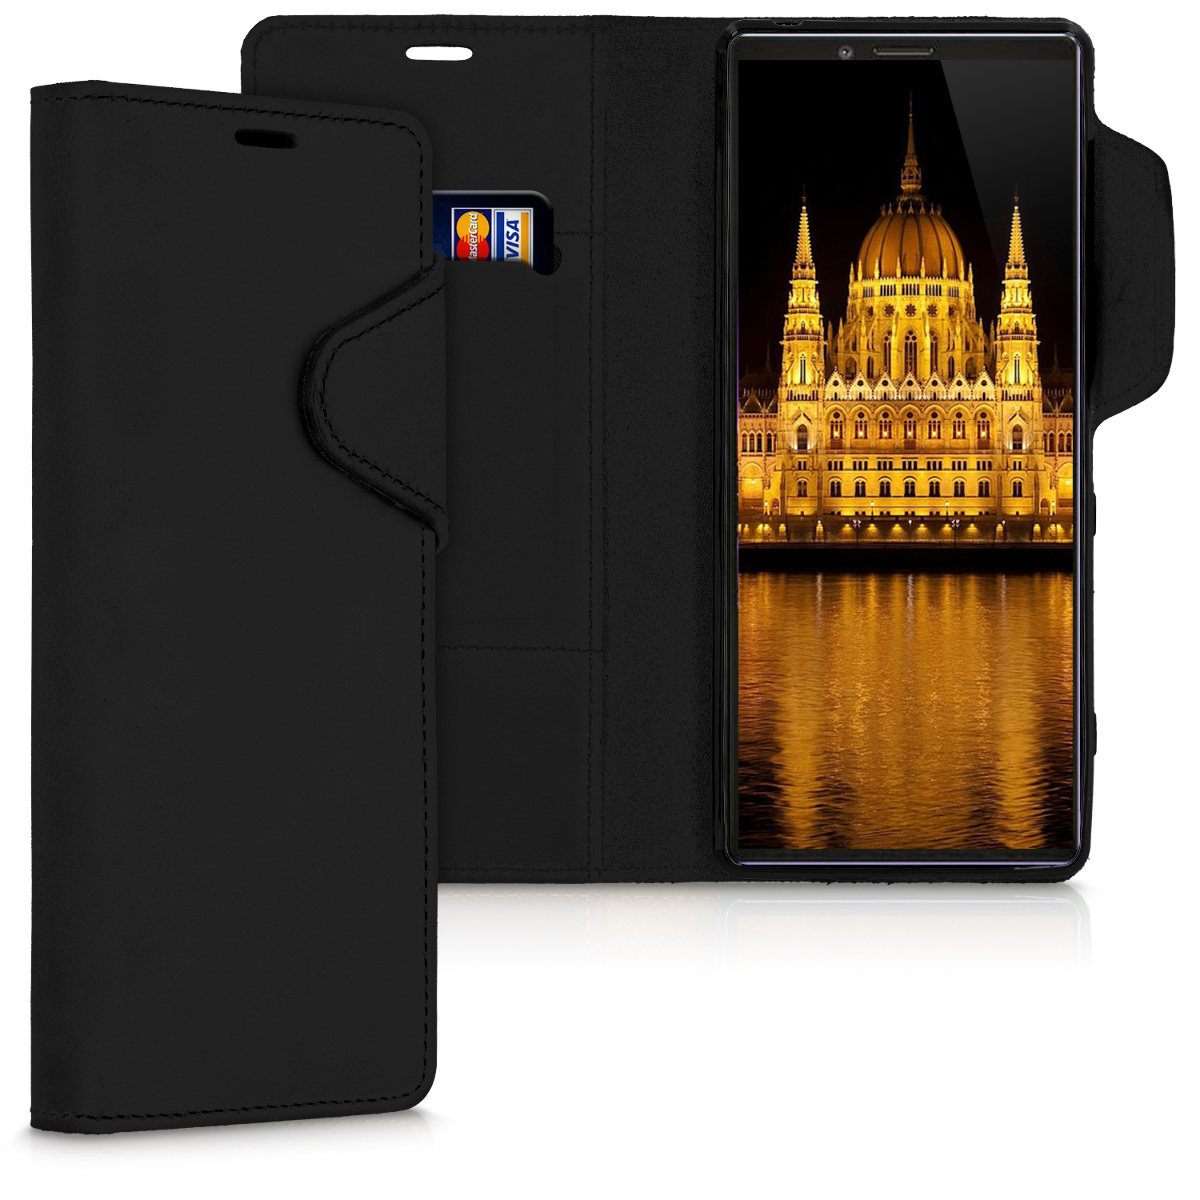 Kalibri Δερμάτινη Suede Θήκη - Πορτοφόλι Sony Xperia 1 - Black (49414.01)